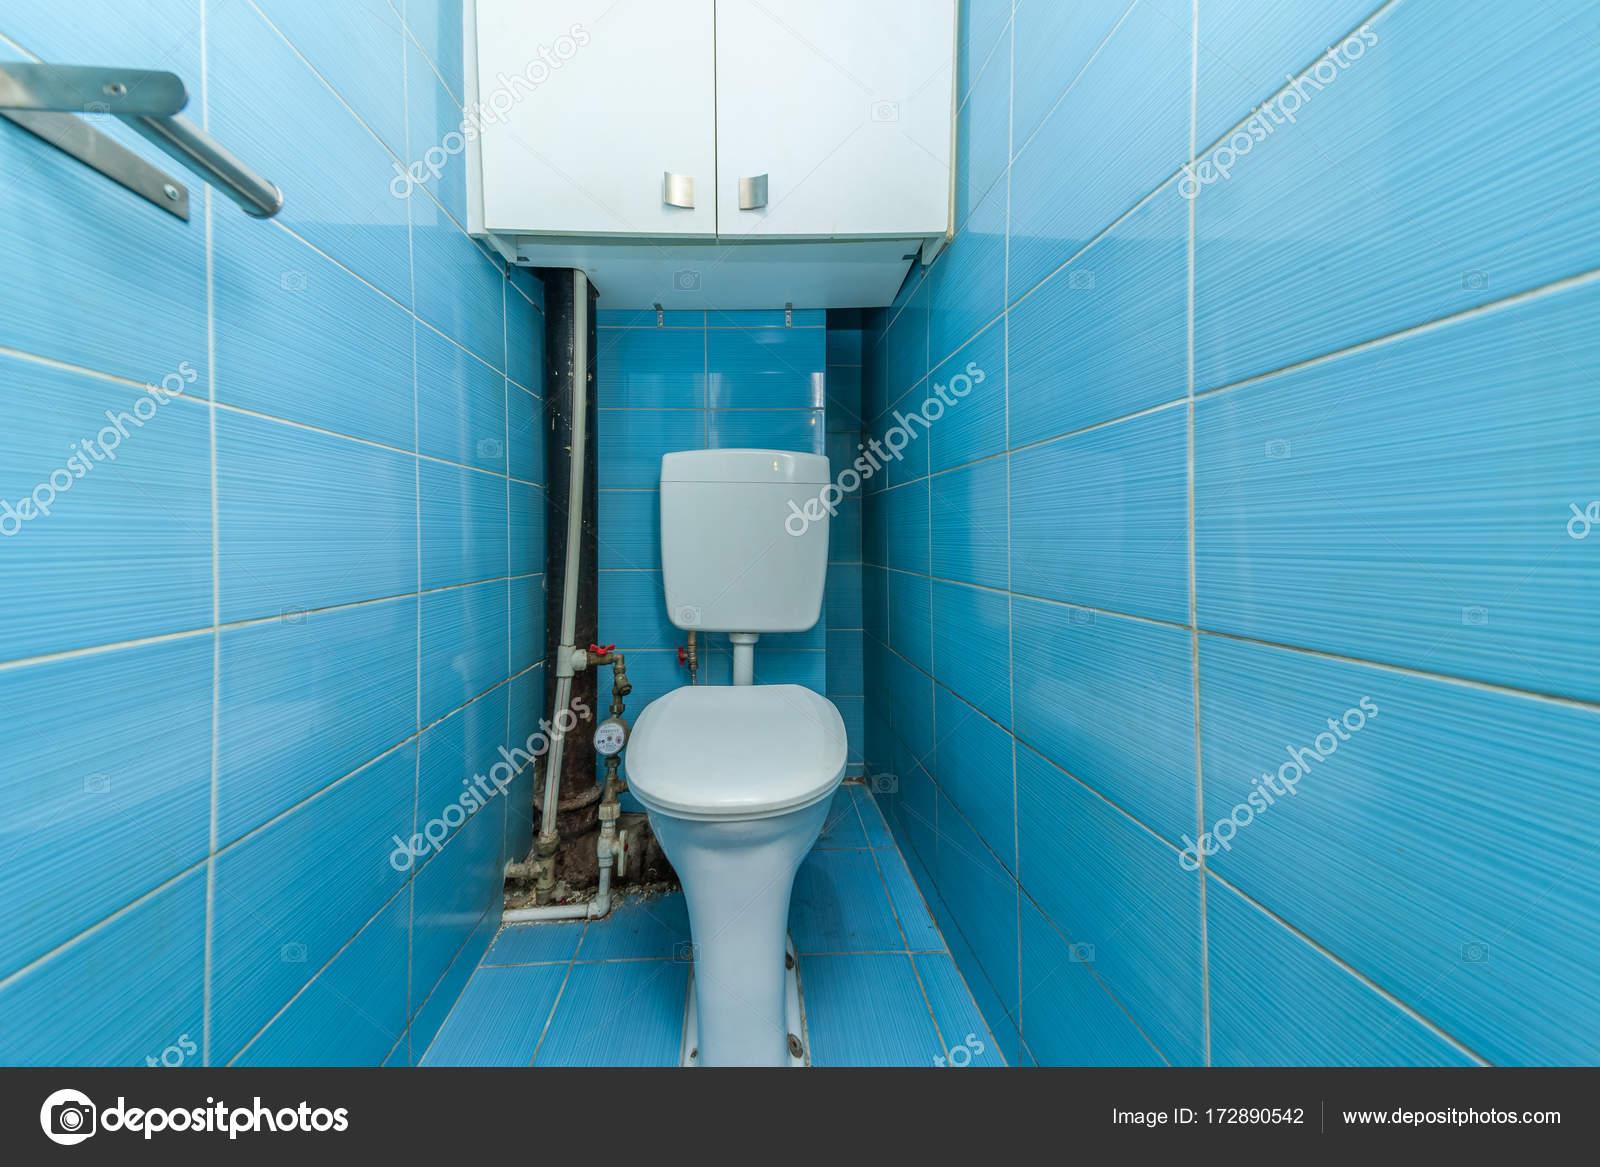 Best klassieke toiletten images aircraft airplane airplanes